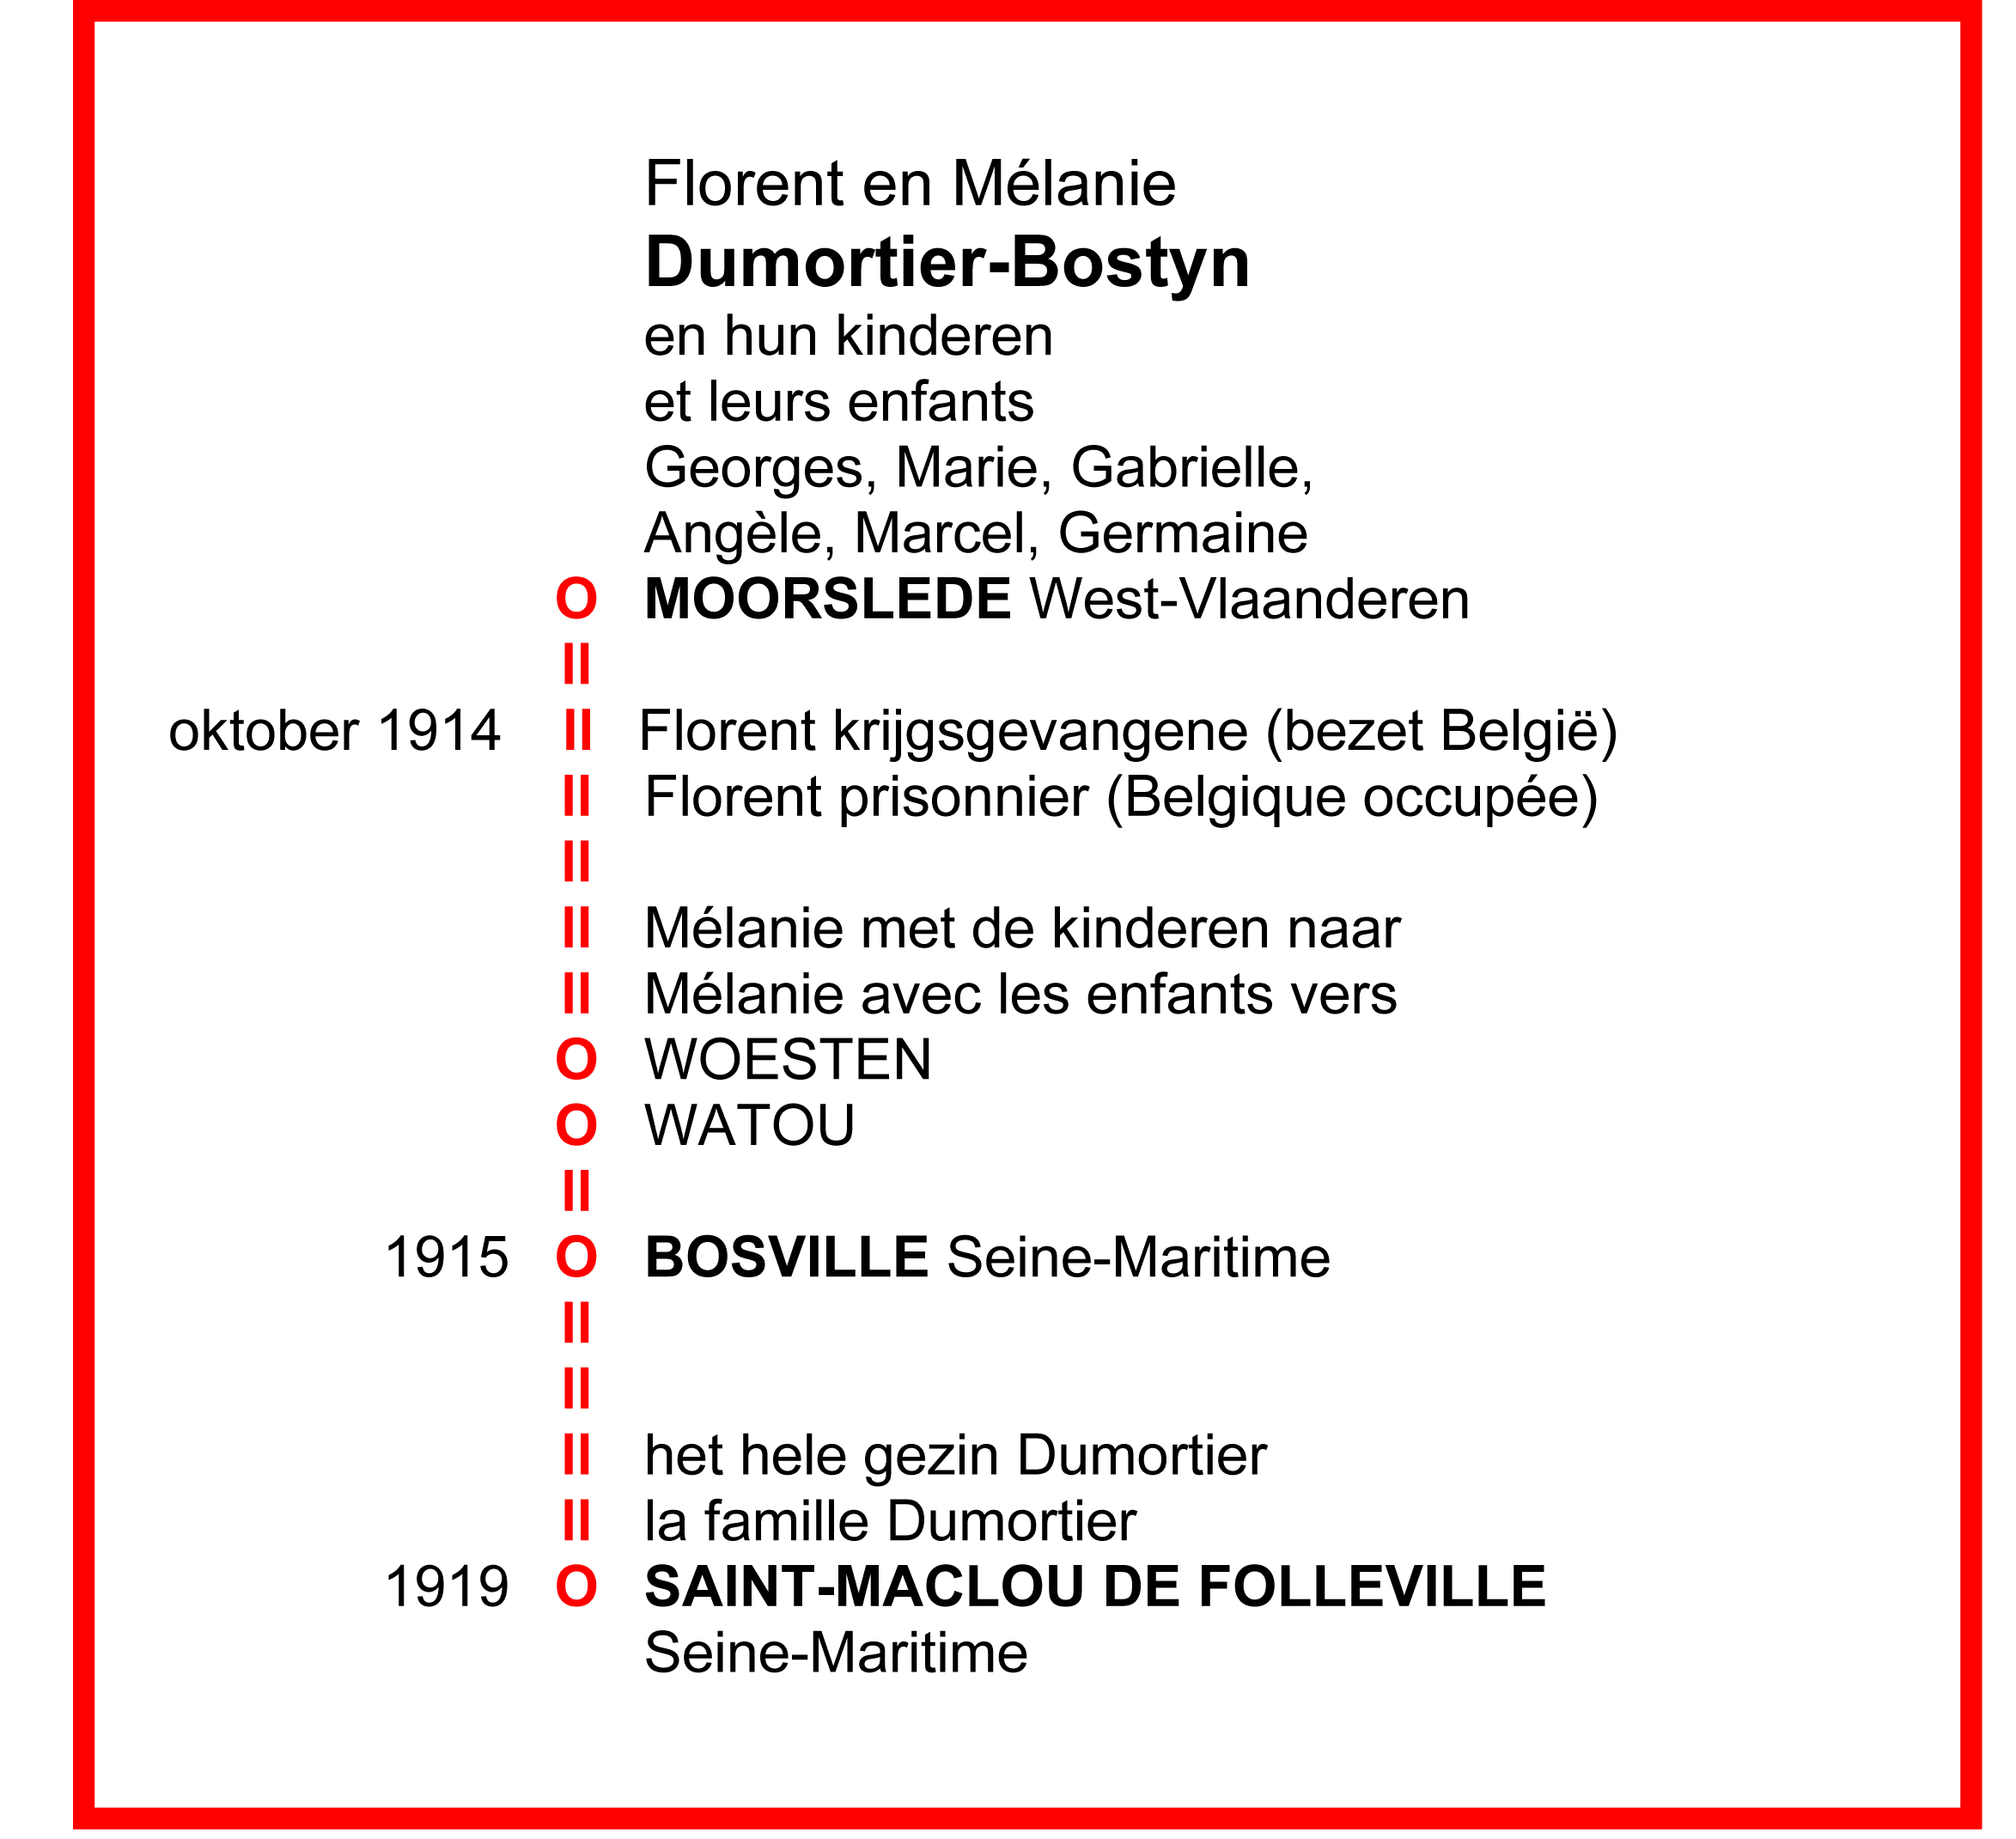 Circuit de fuite Dumortier-Bostyn